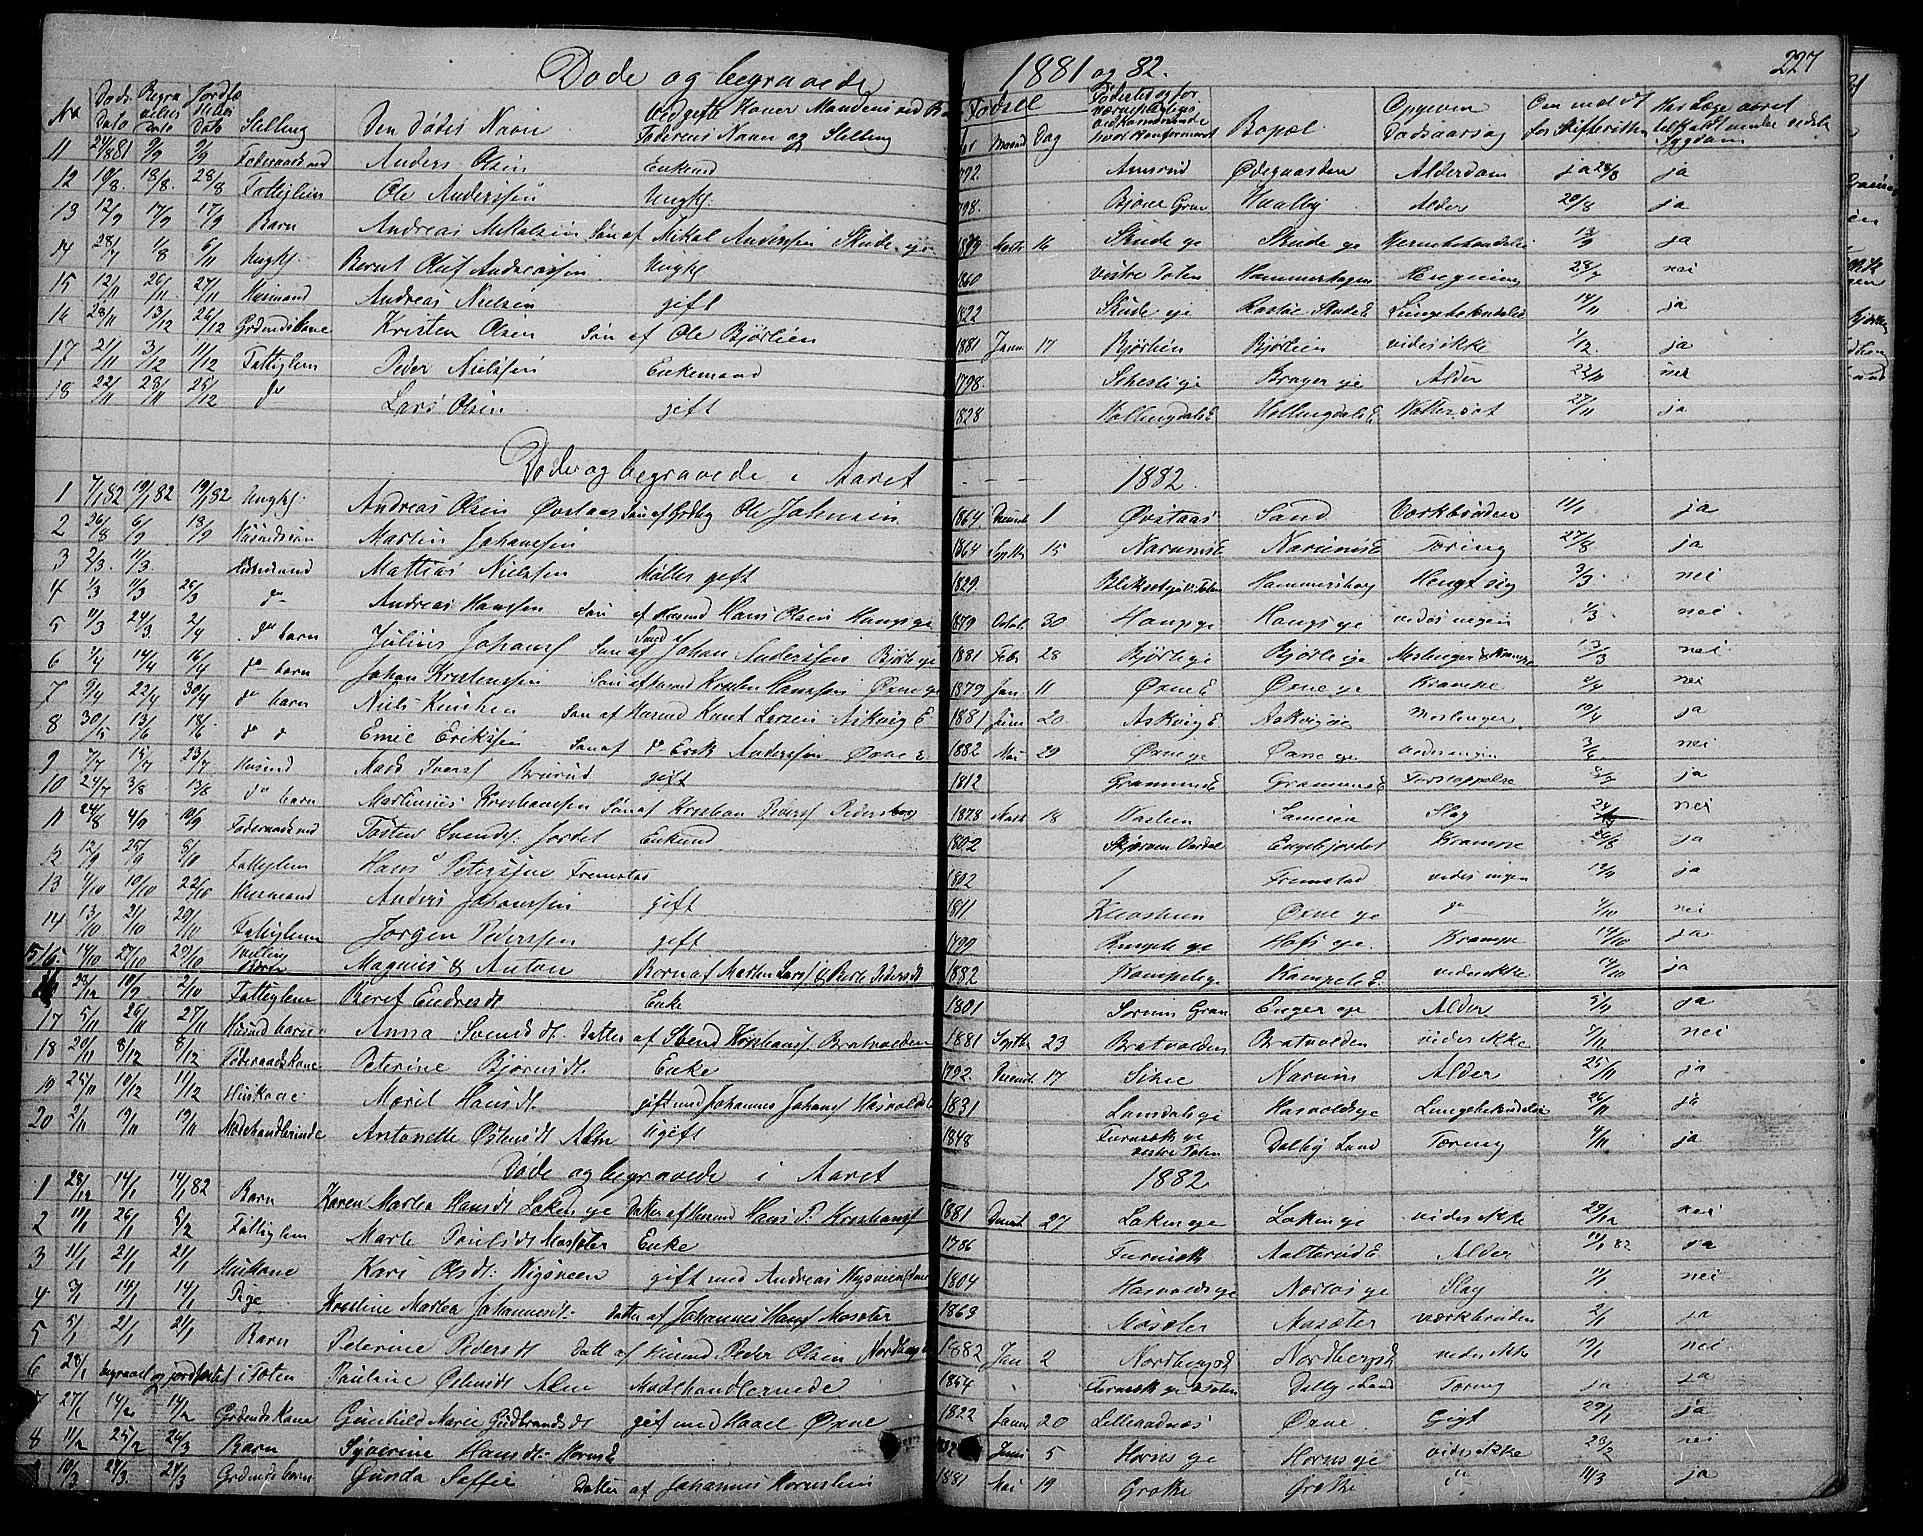 SAH, Søndre Land prestekontor, L/L0001: Klokkerbok nr. 1, 1849-1883, s. 227